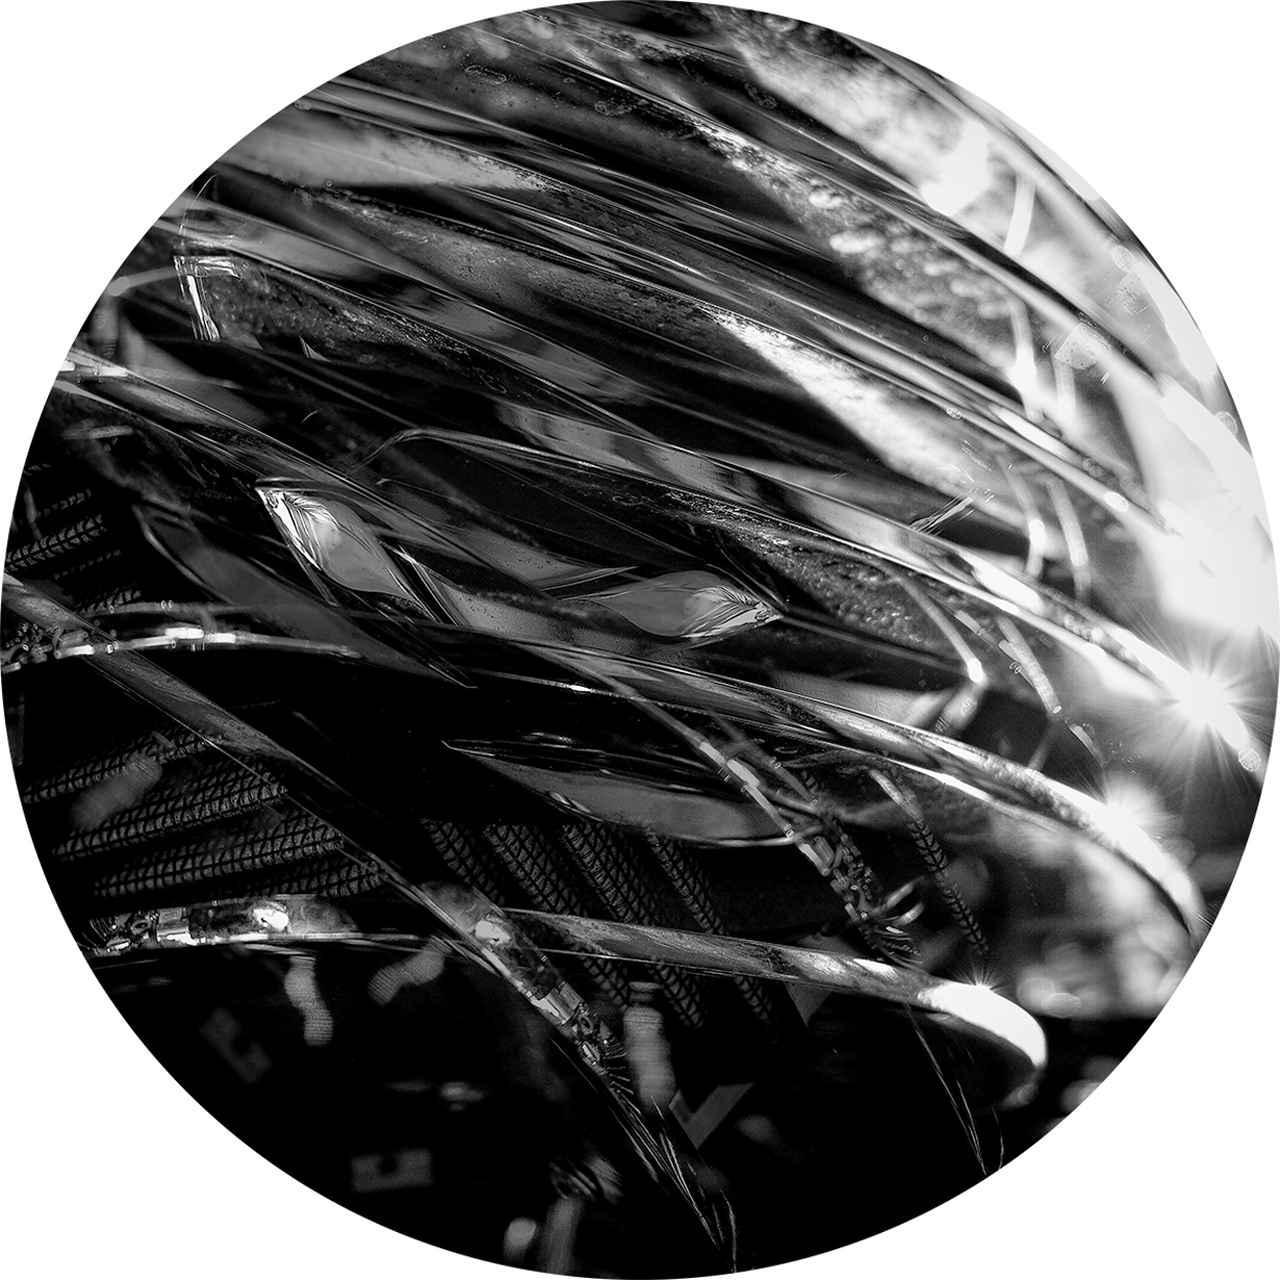 画像: ■写真展タイトル:『探険記 MOTORROCK-KS 2013-2019』 ■日程:2019年11月19日(火)~年12月1日(日) ※11月25日(月)休廊 12:00~19:00(日曜日 ~17:00) ■会場:Jam Photo Gallery 東京都目黒区目黒 2-8-7 鈴木ビル2階 B号室 TEL050-5438-2134 E-Mail : info@jamphotogallery.com